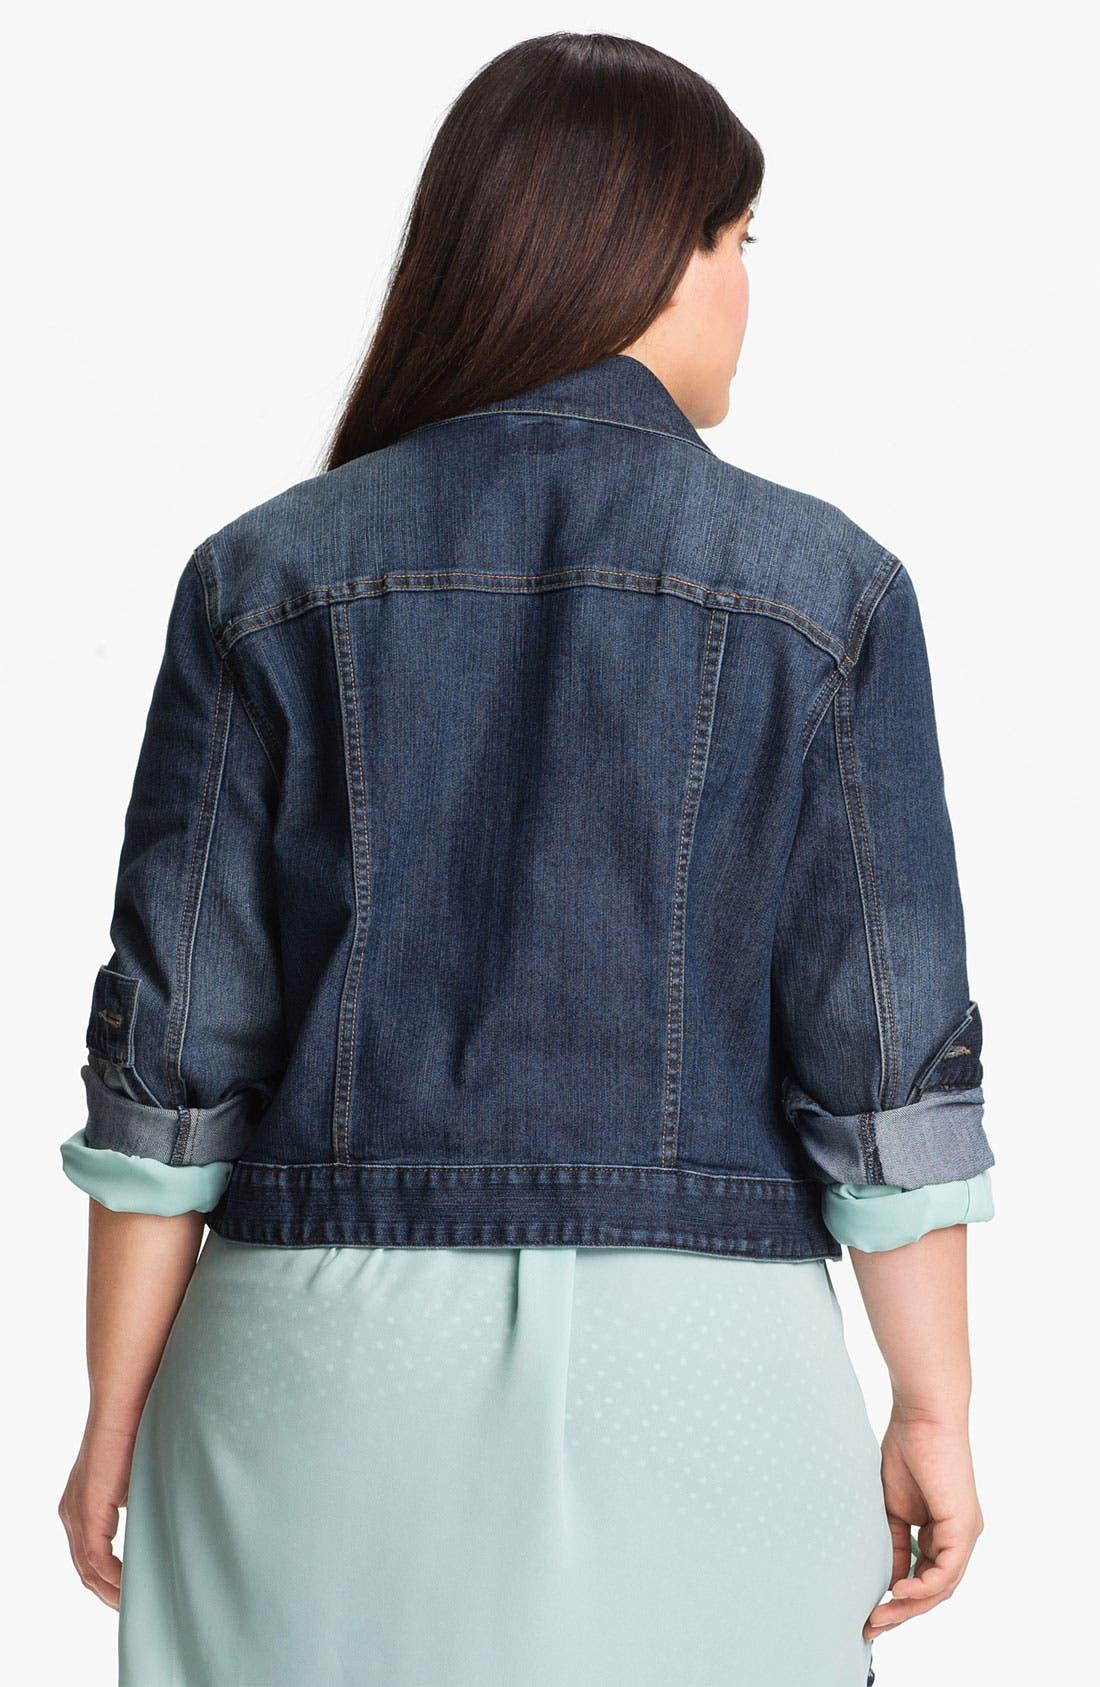 Alternate Image 2  - Jag Jeans 'Rupert' Denim Jacket (Plus Size)